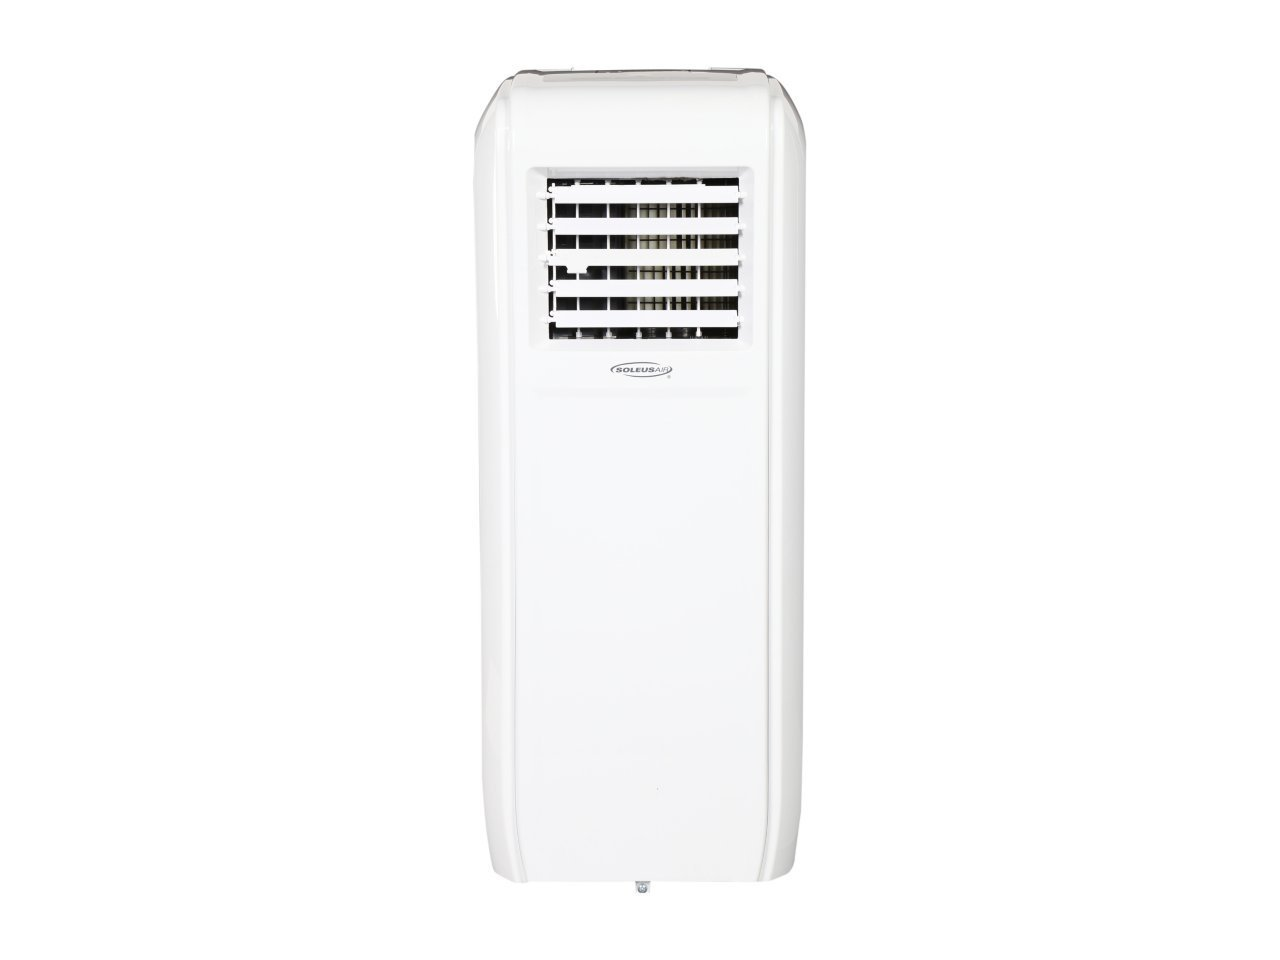 Buy Johnson Controls T 4756 202 Pneumatic Thermostat Auto